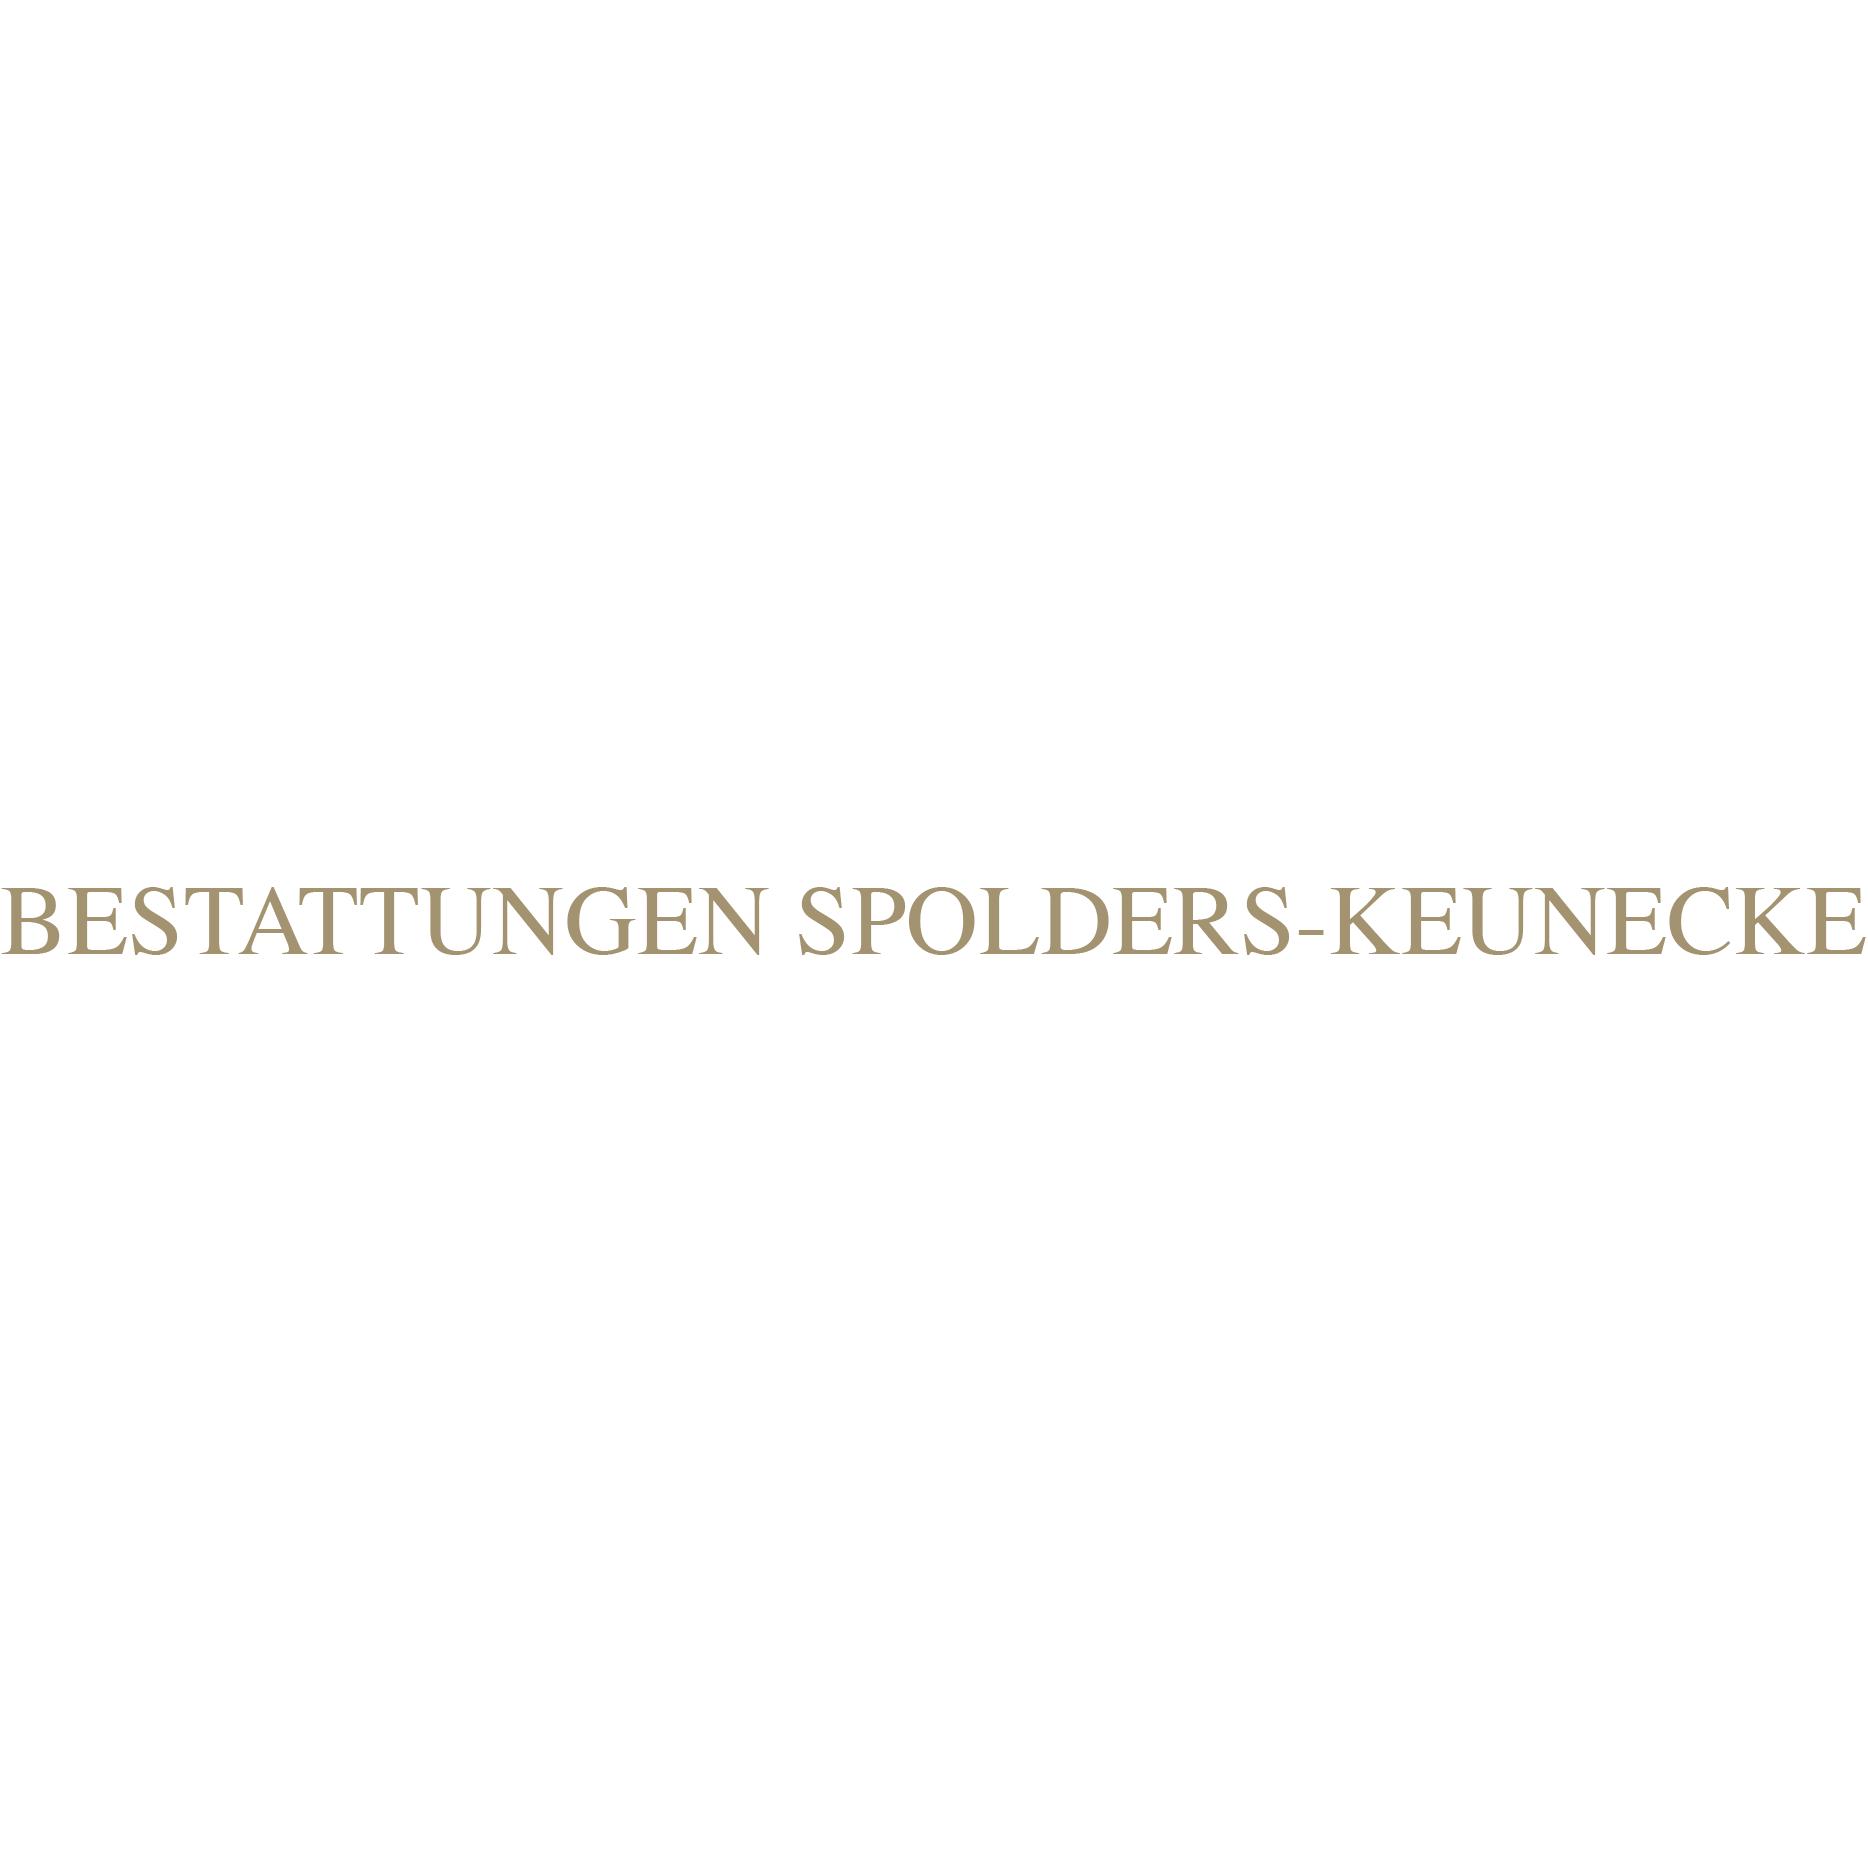 Bestattungen Spolders-Keunecke GmbH&Co.KG